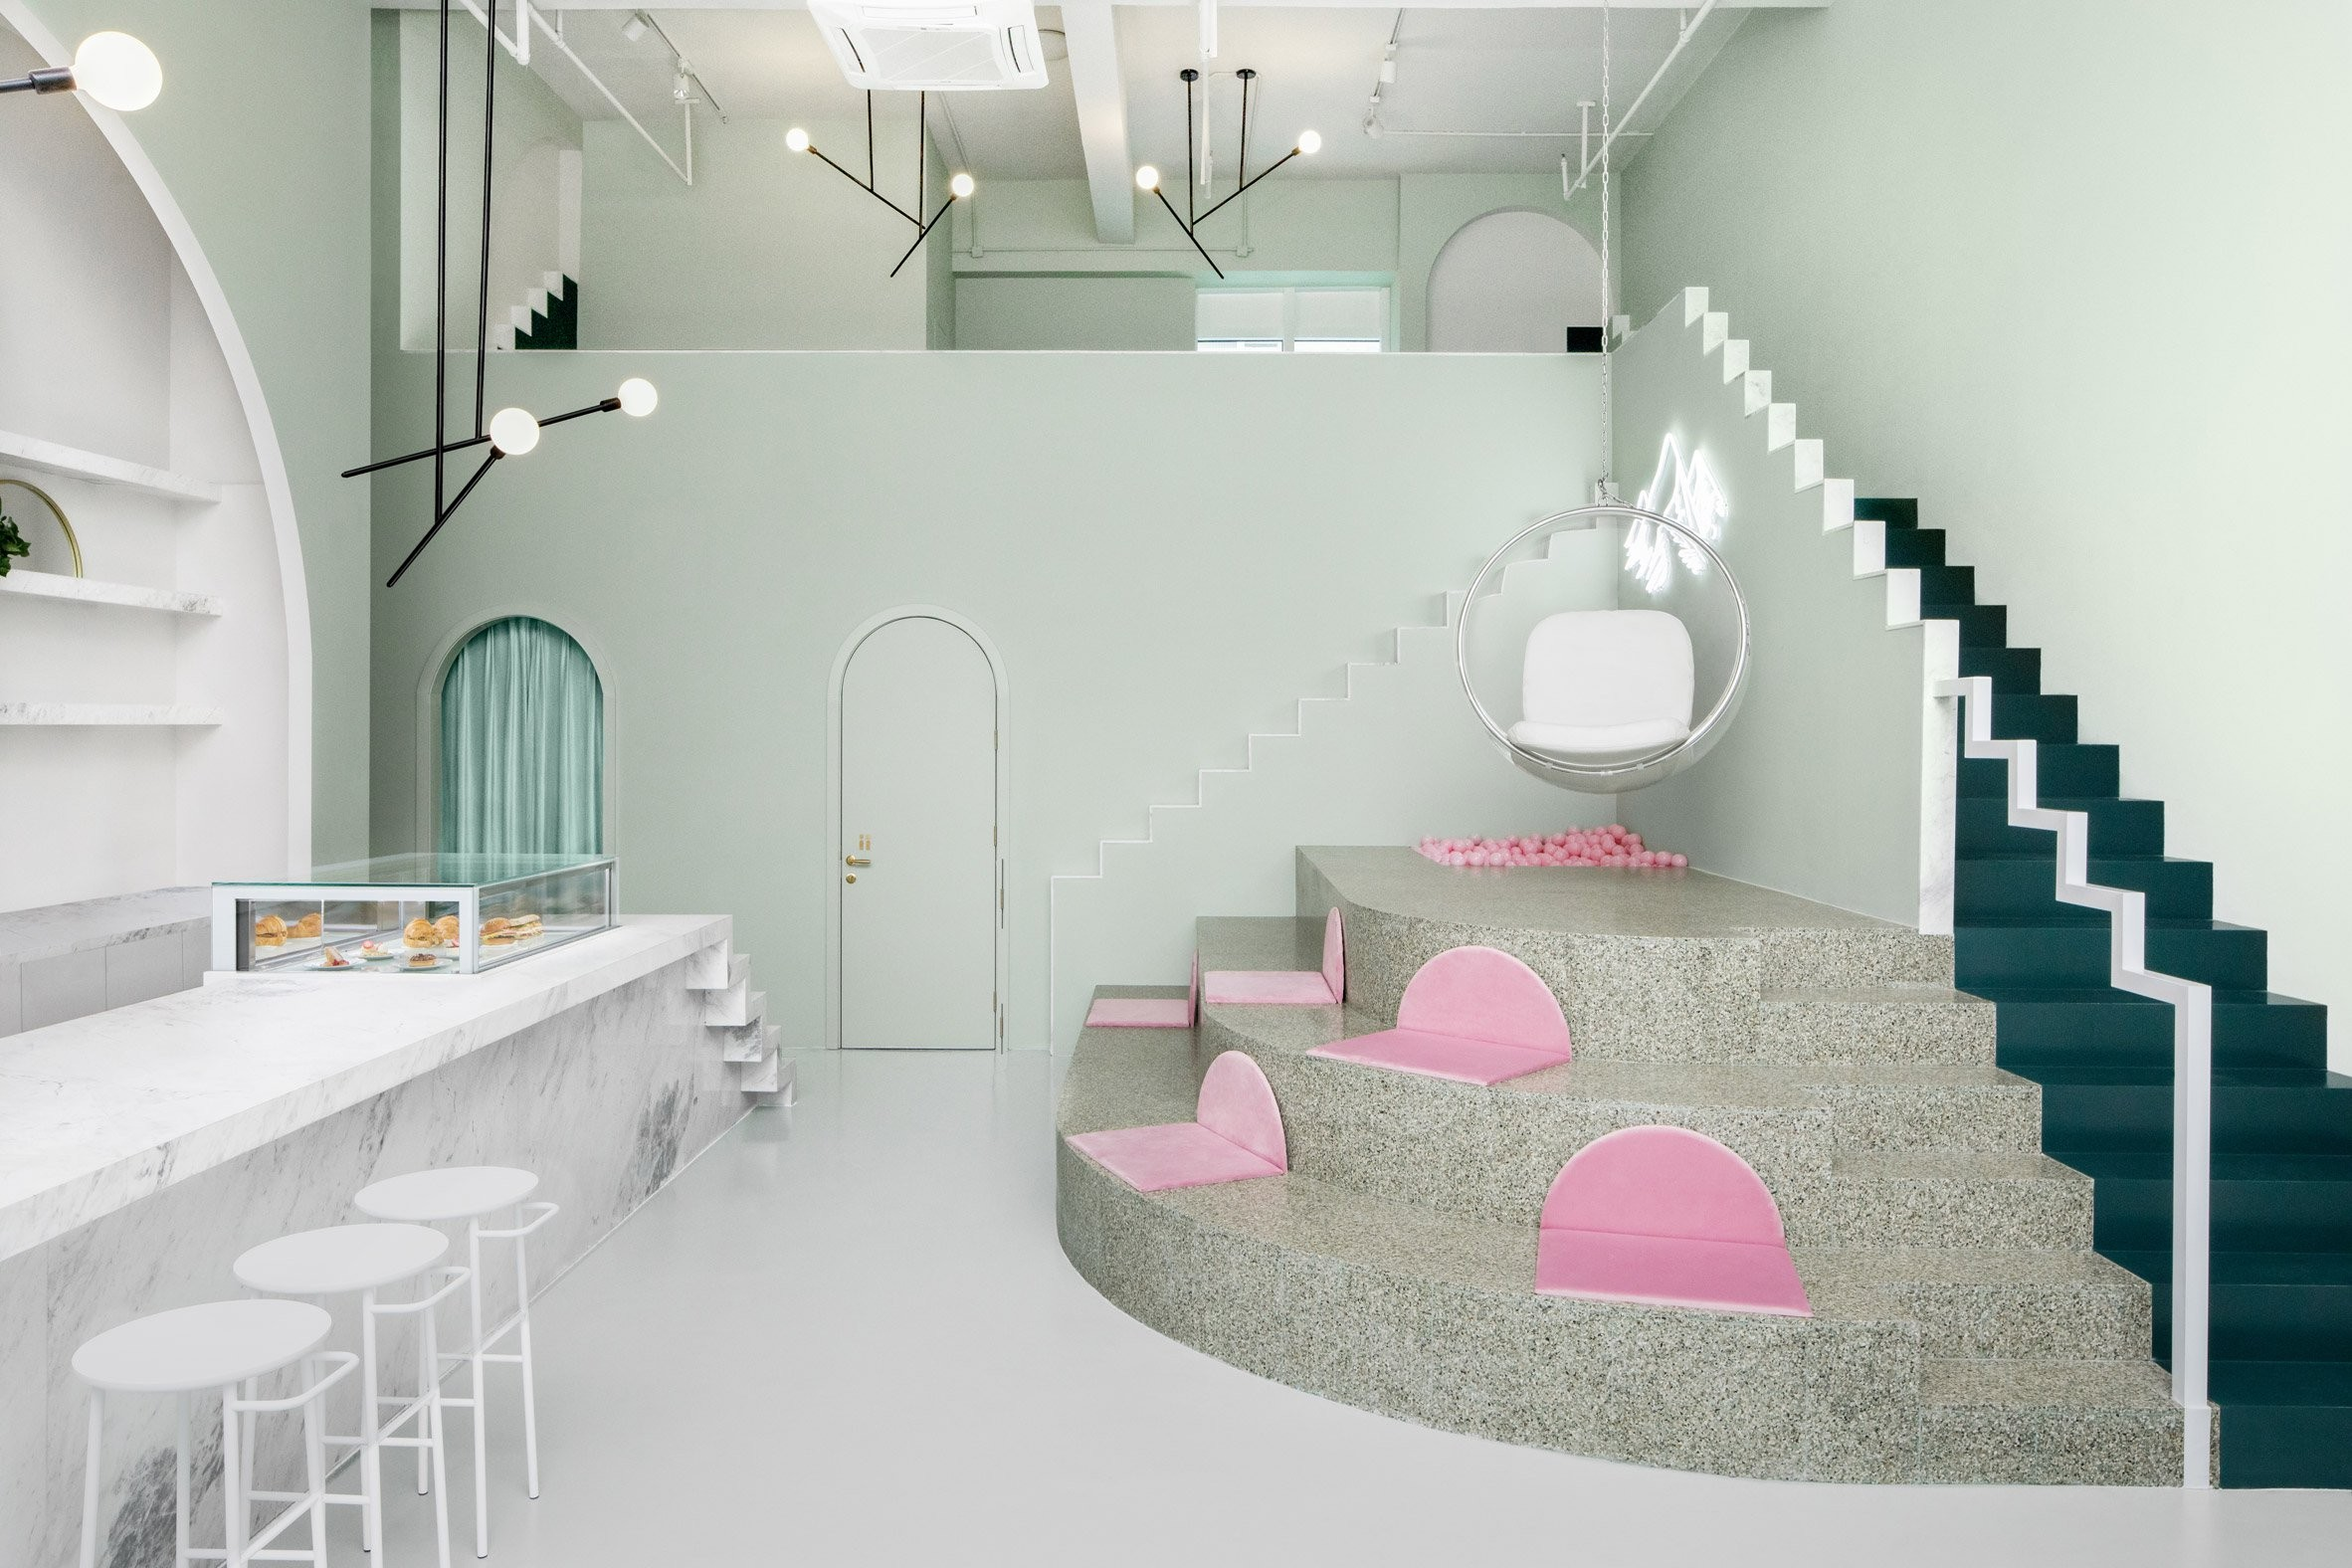 budapest-cafe-2.jpg